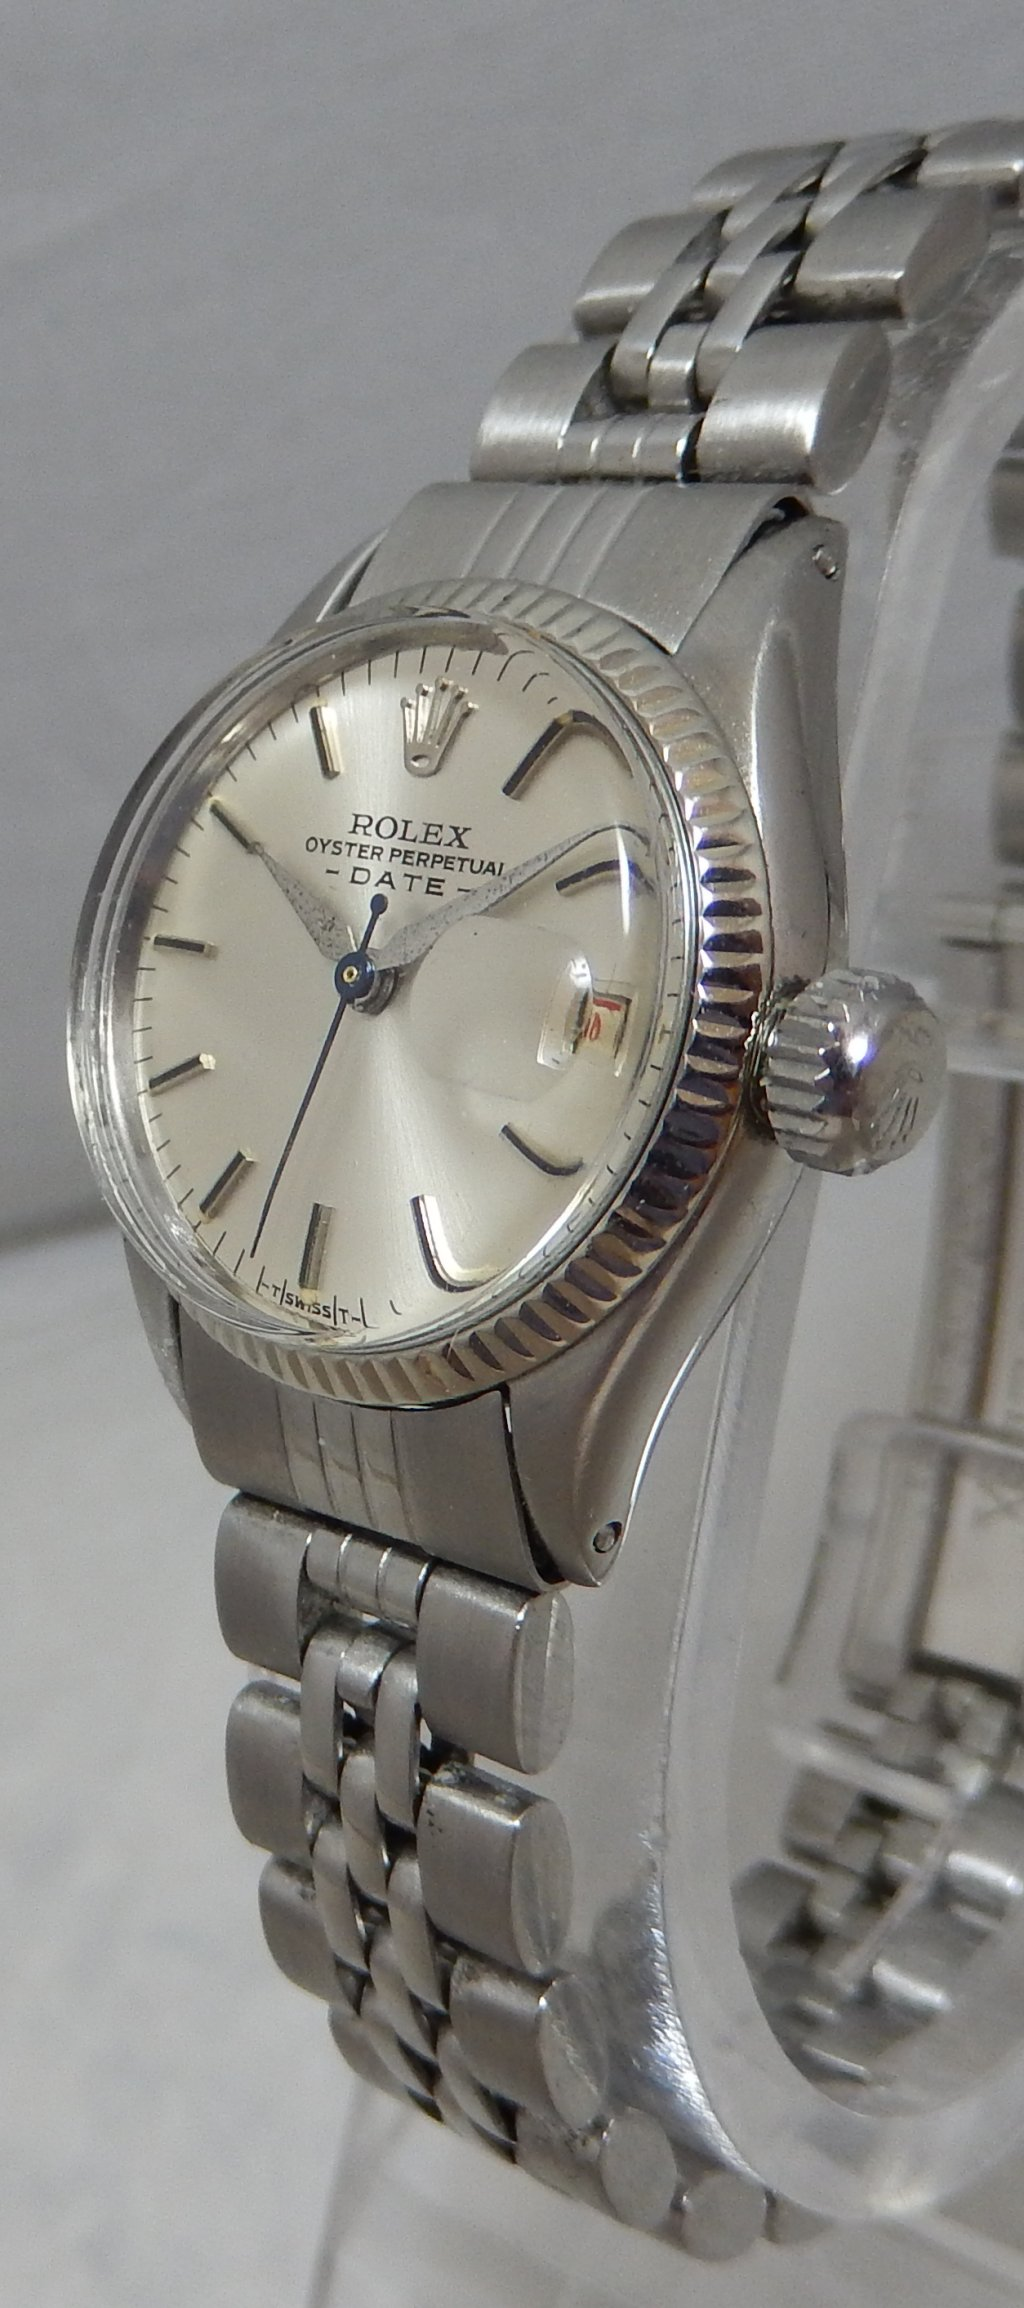 Reloj Señoras Oyster Rolex Permanente De Oro 26 Hora Fecha Ss Blanco PiOXukZT